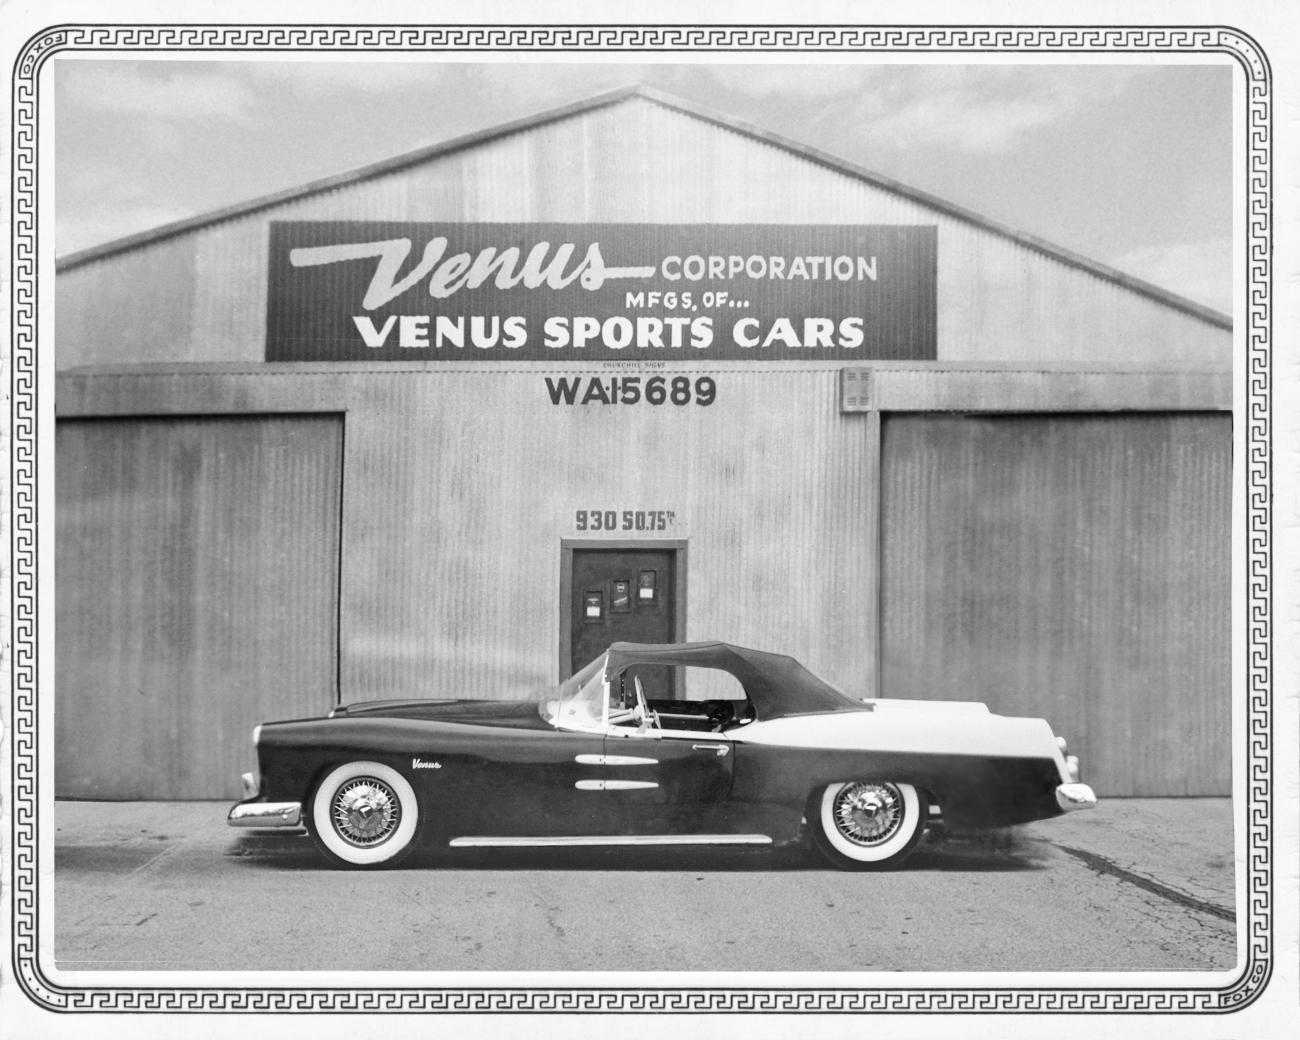 Venus TwoTone Restored